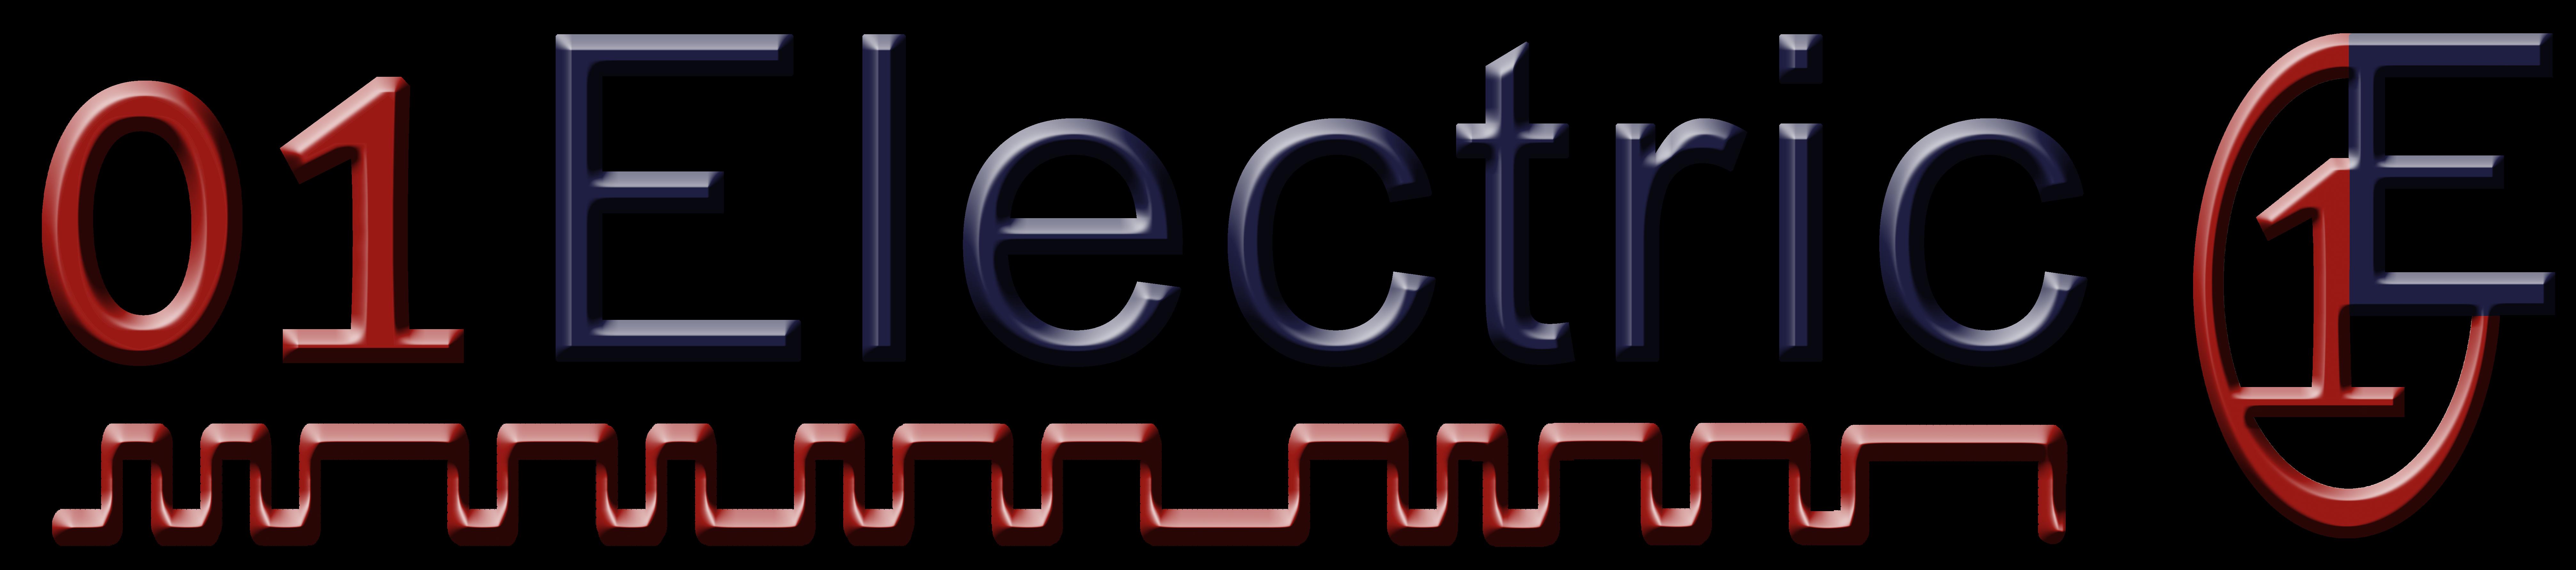 01Electric